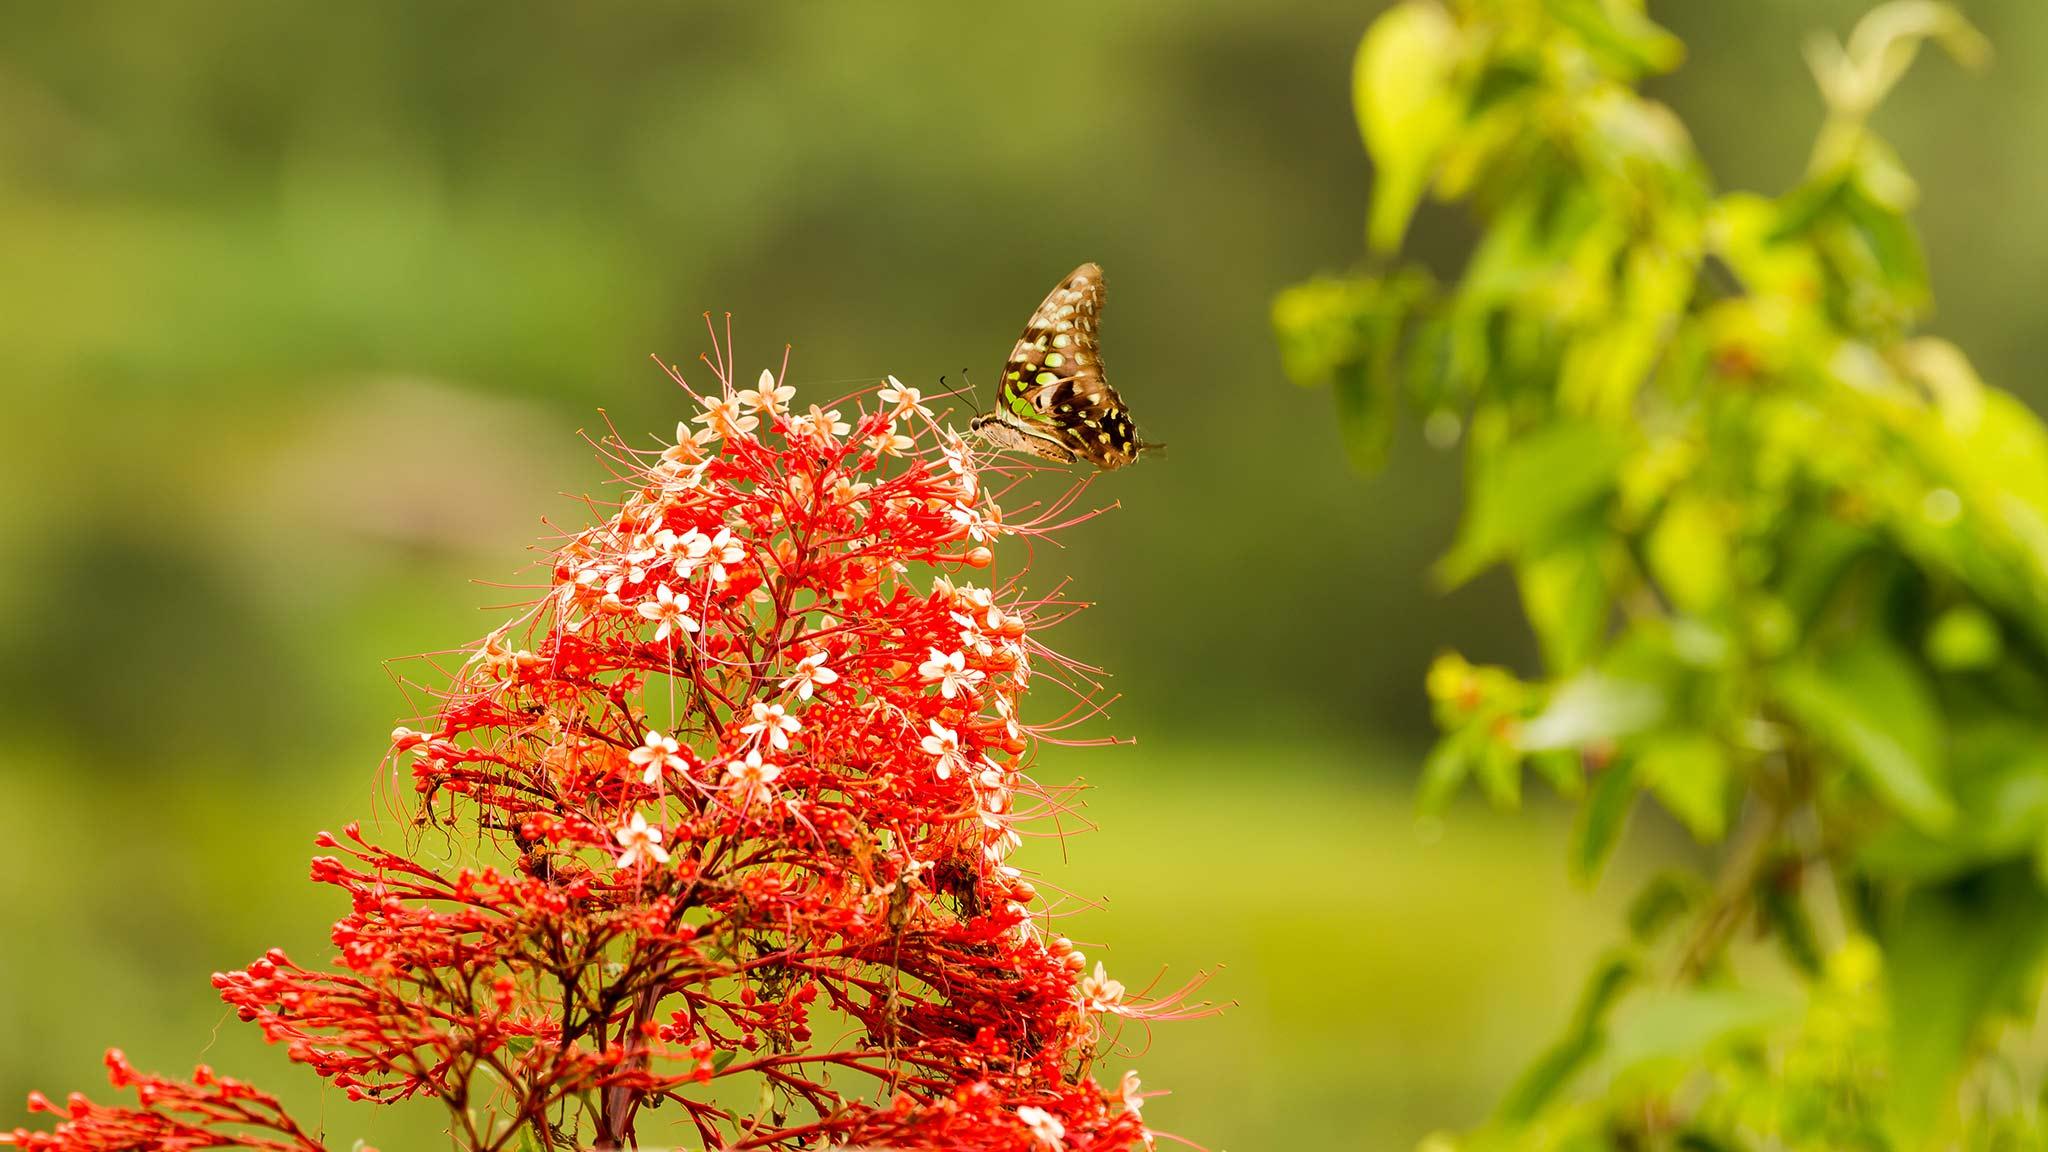 Butterfly on a flower in the Bali Butterfly Park